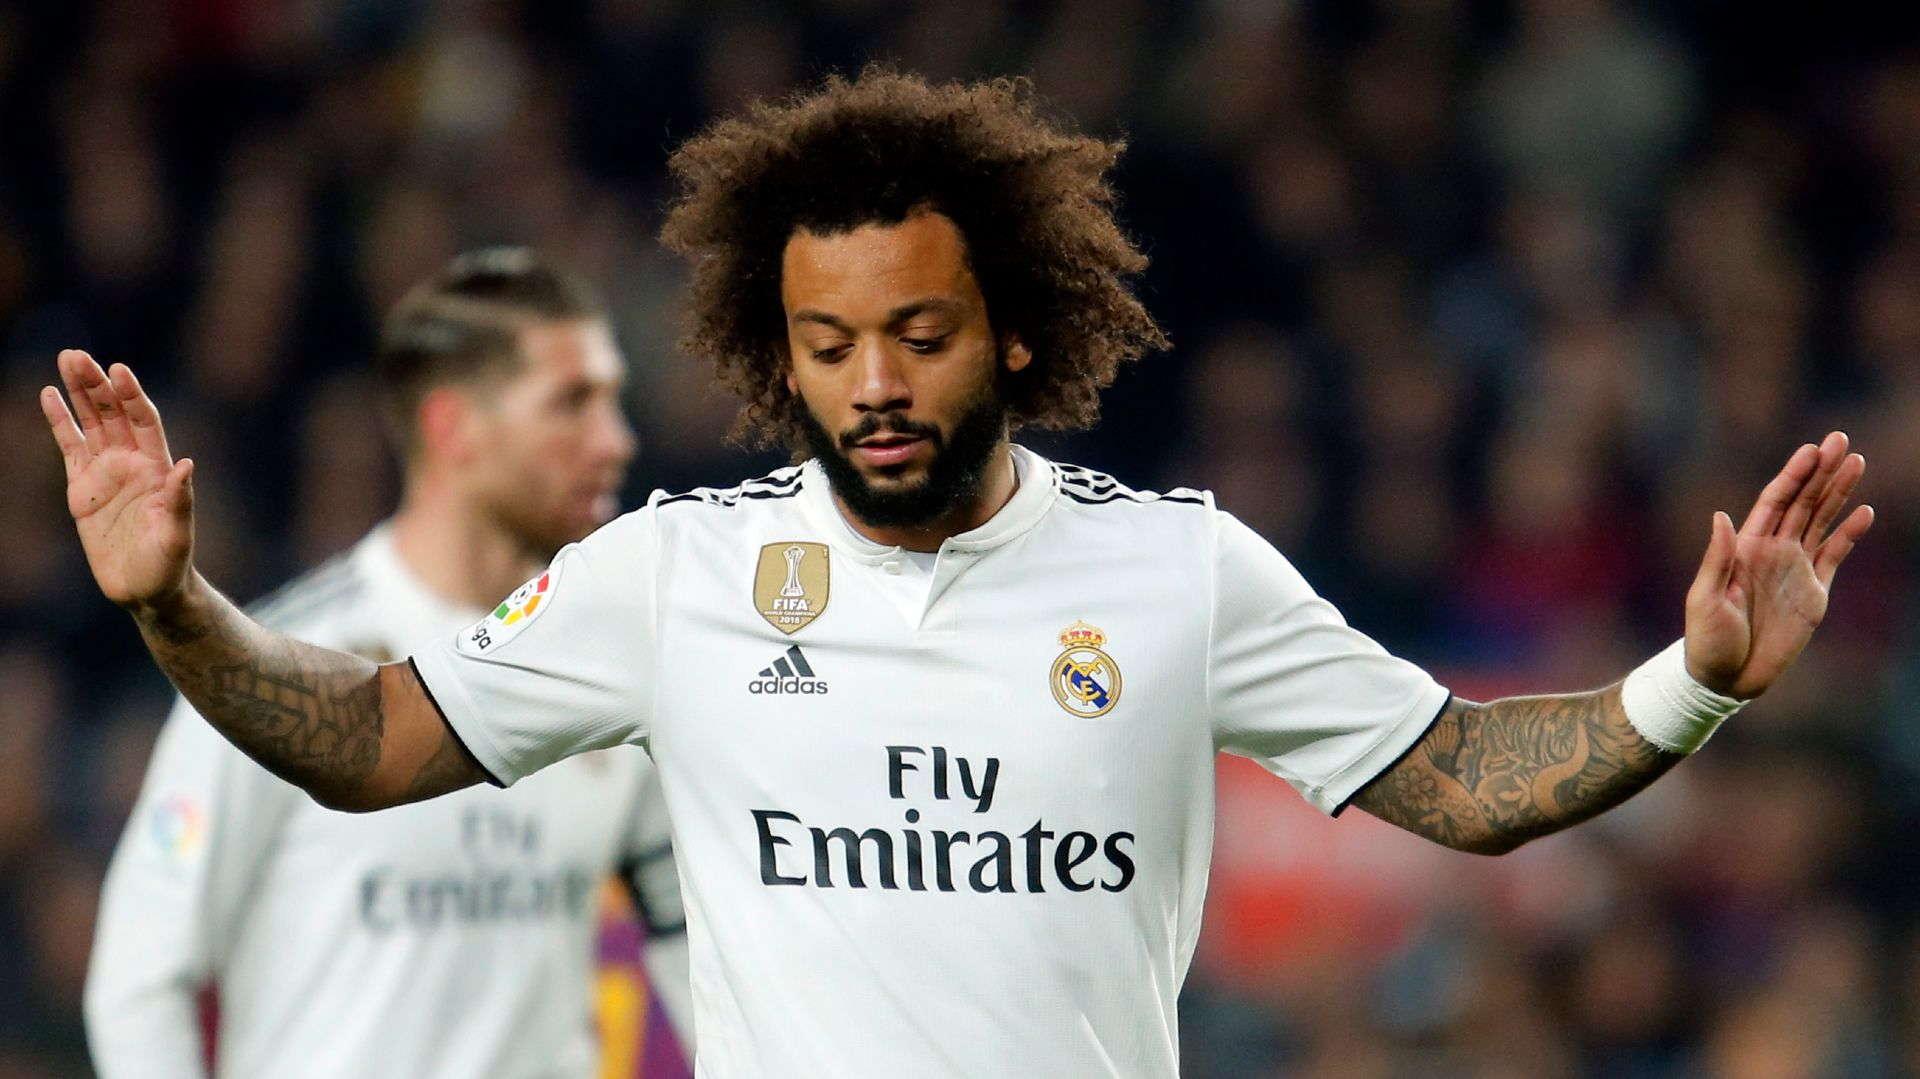 Santiago Solari : Marcelo 100% Real Madrid